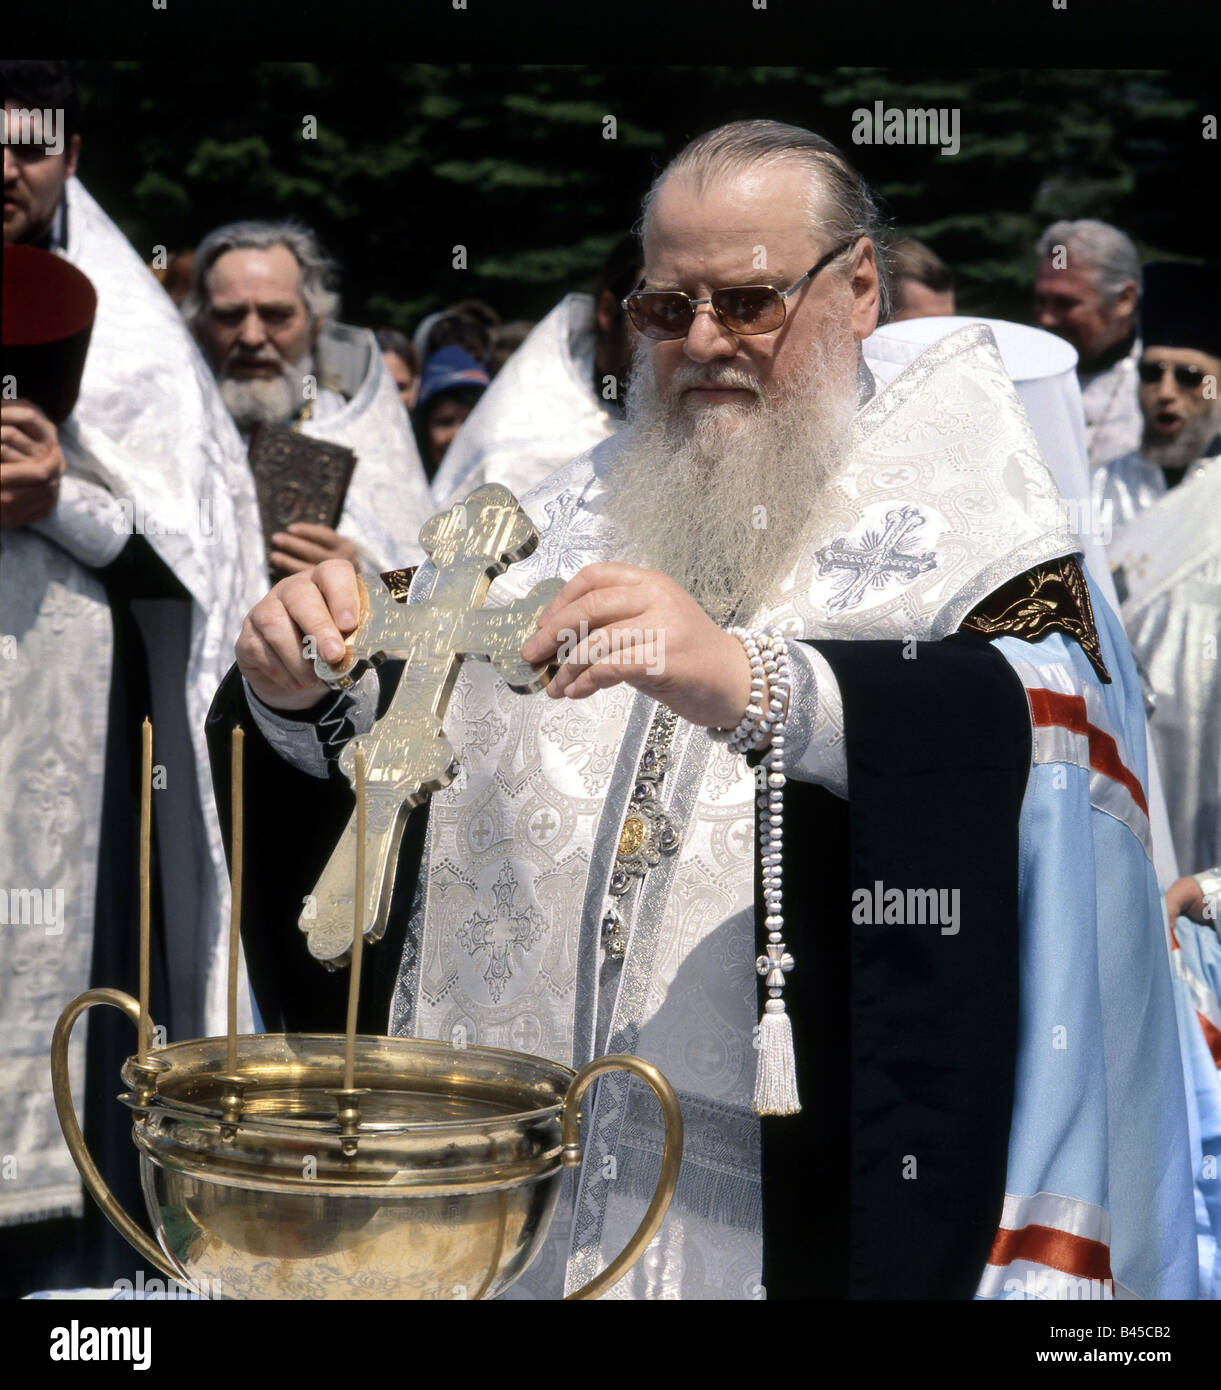 geography / travel, Russia, religion, russian orthodox church, metropolitan of Krasnodar and Kuban (Isidor) at consecration, - Stock Image